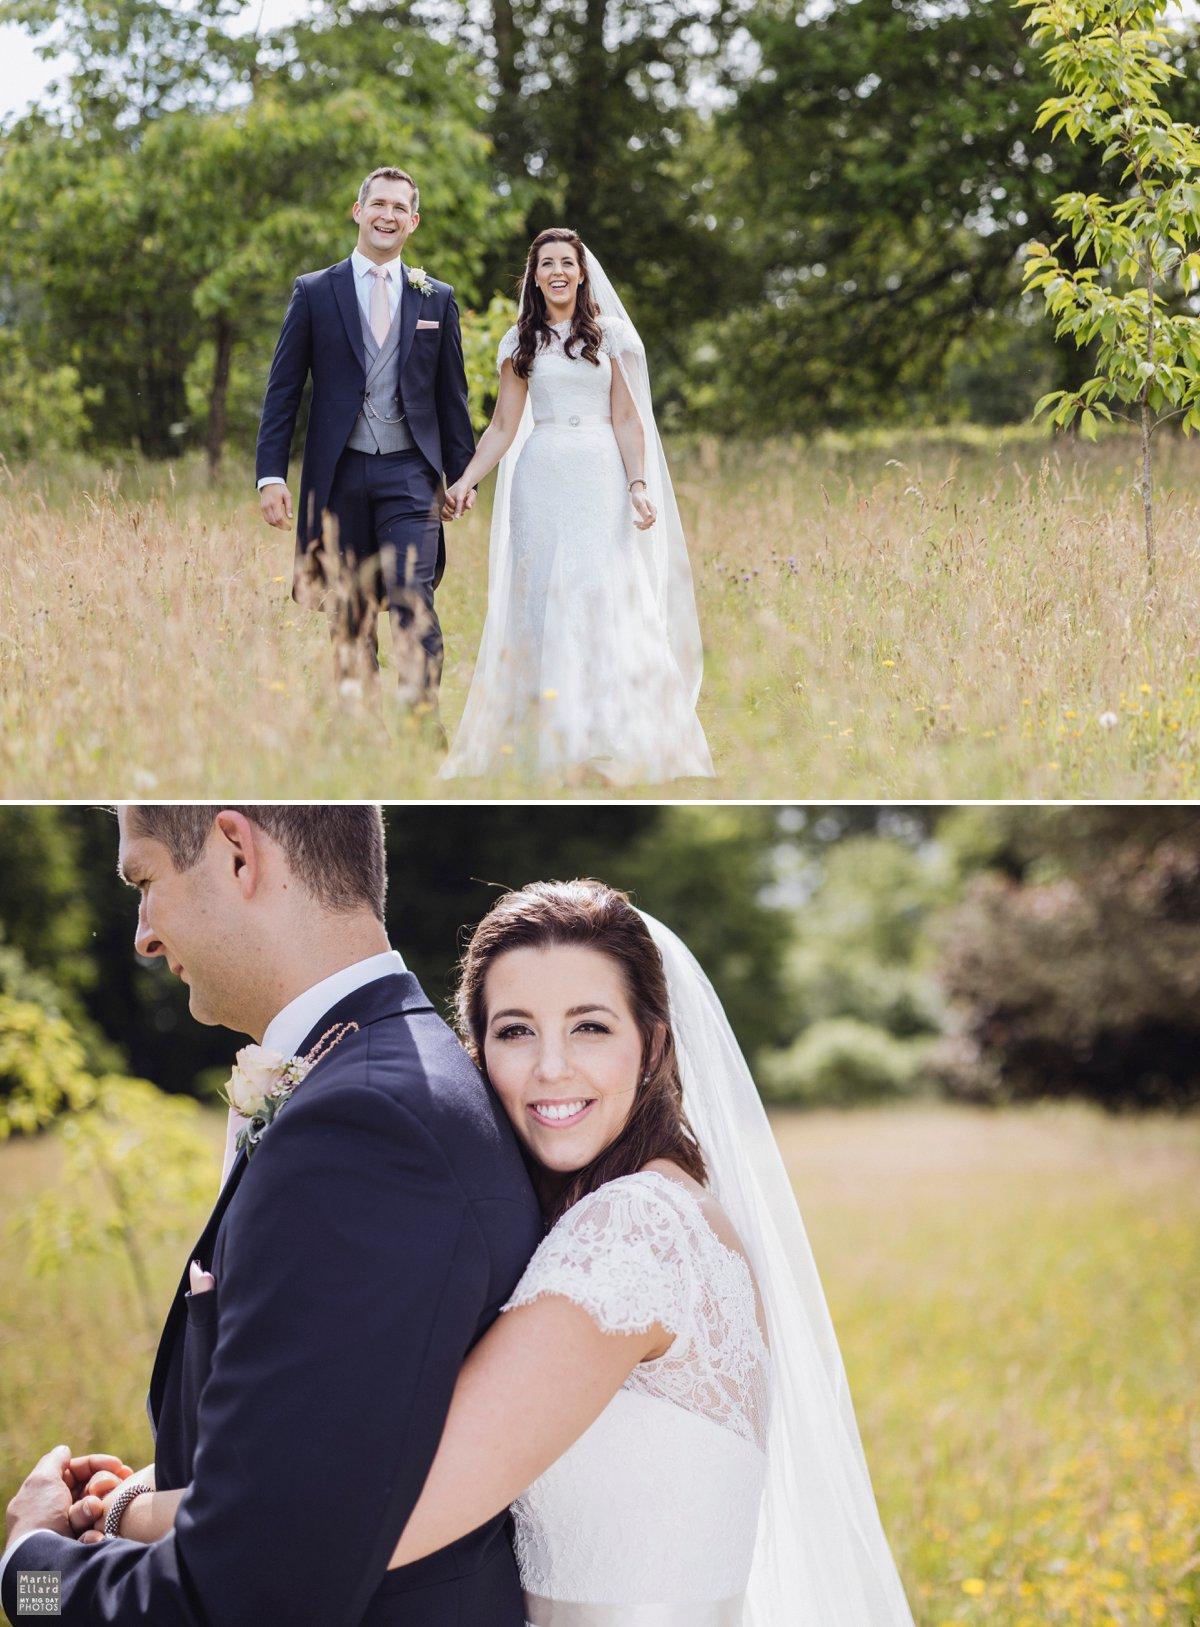 Penpont House wedding photography